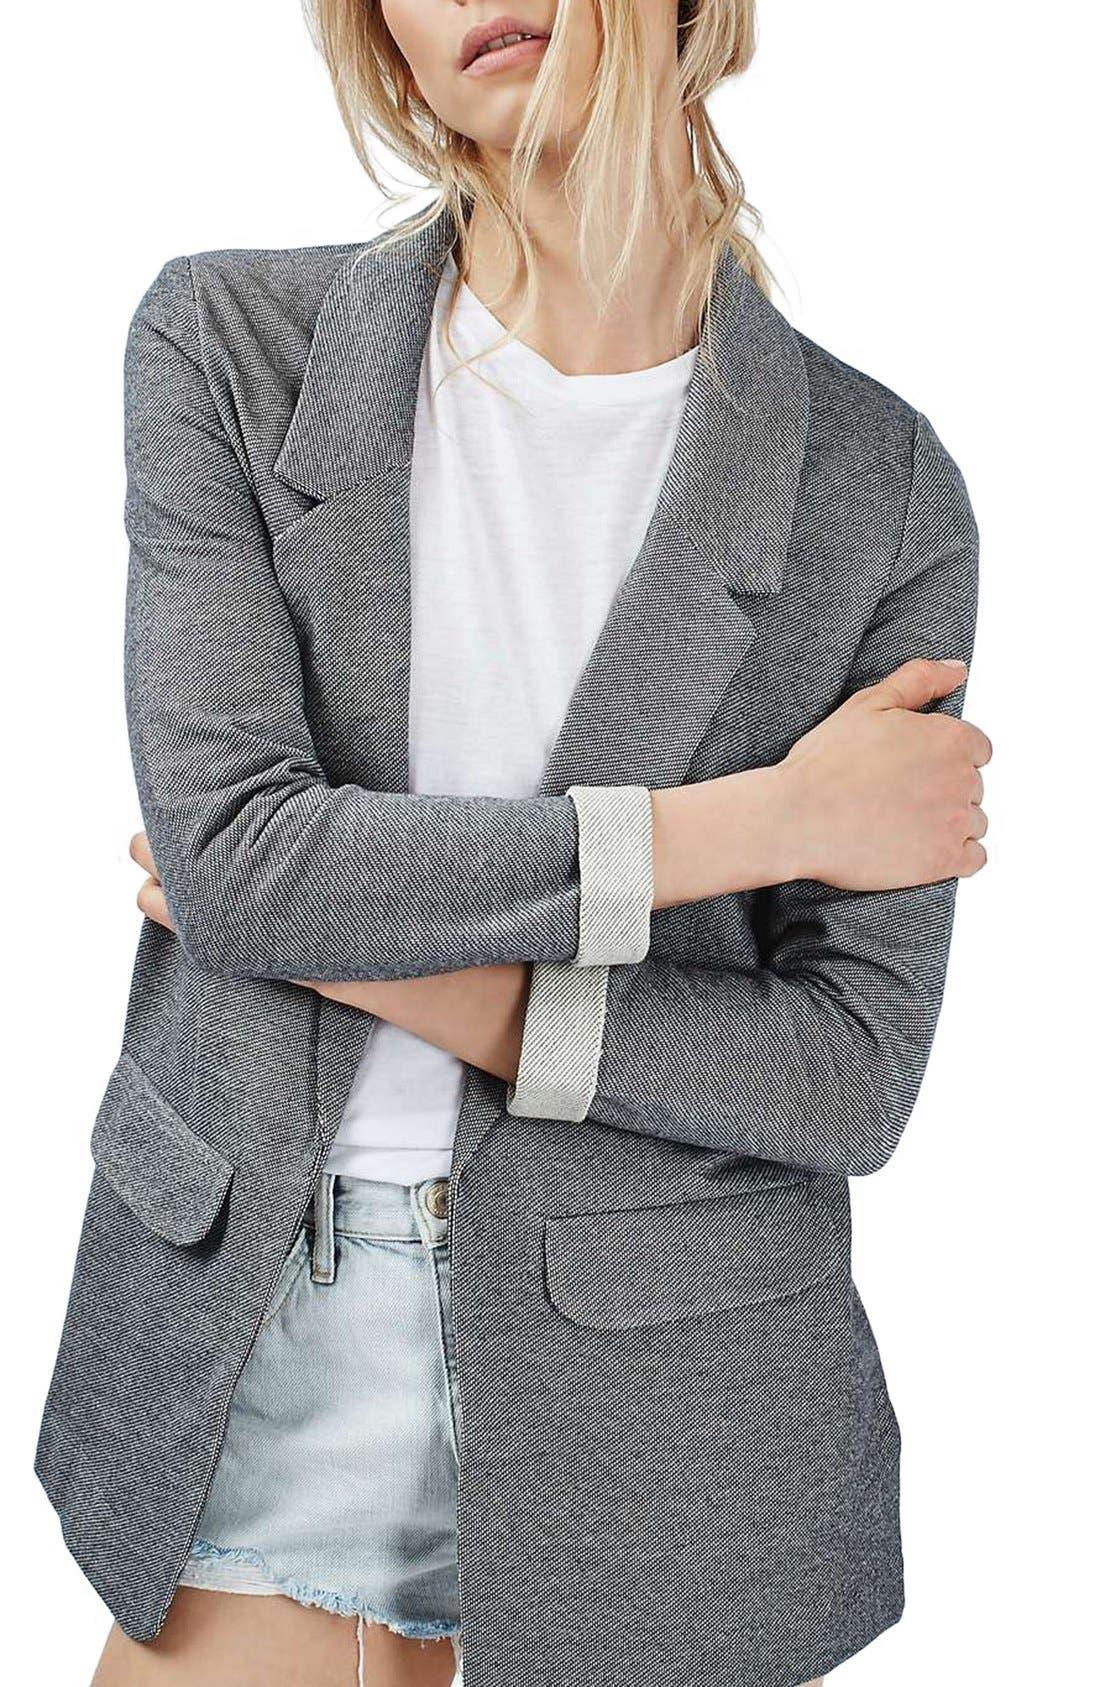 Alternate Image 1 Selected - Topshop 'Emery Tonic' Oversized Boyfriend Blazer